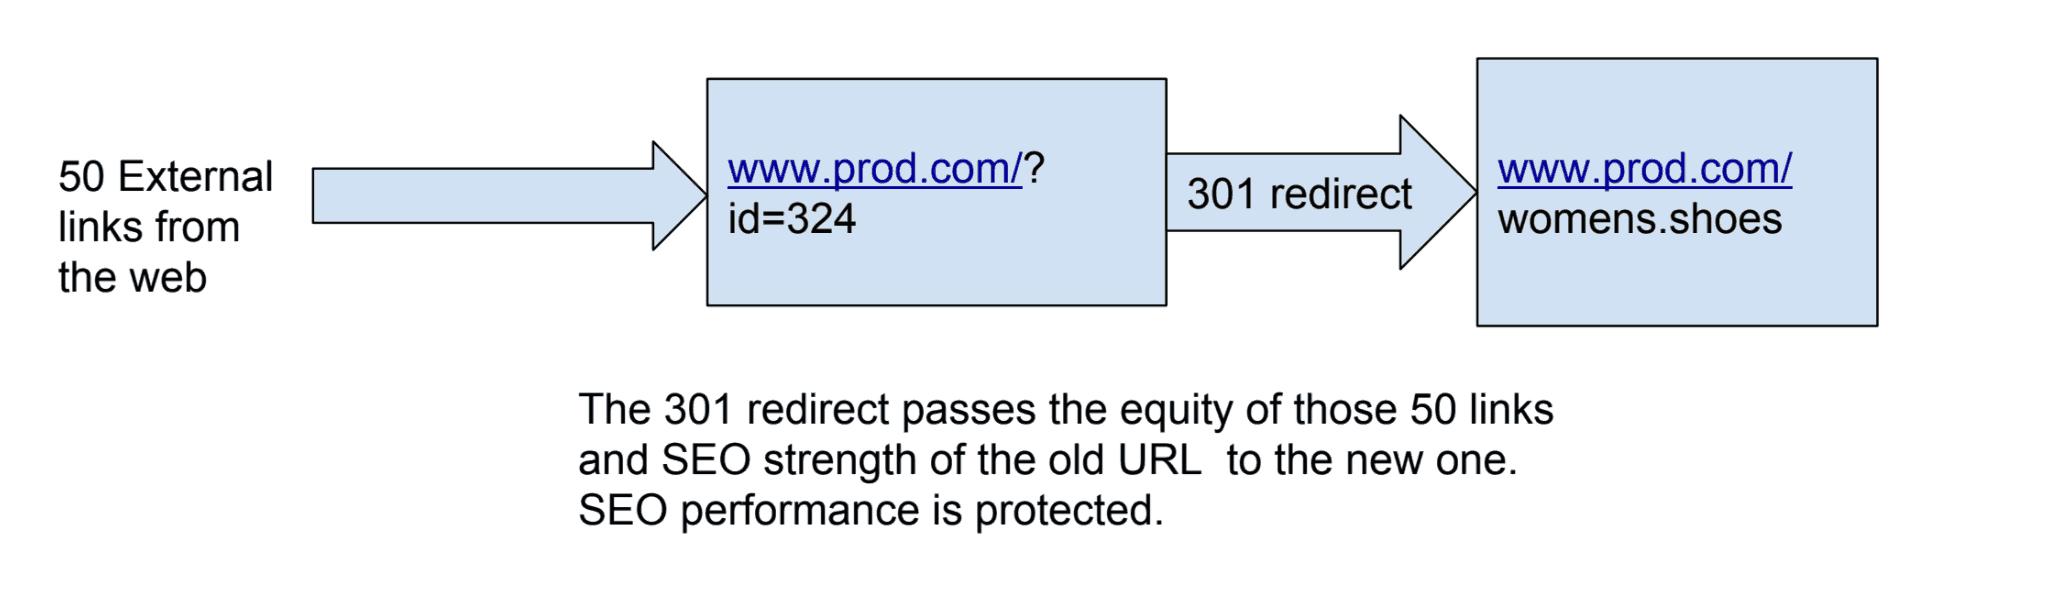 301-redirect-image